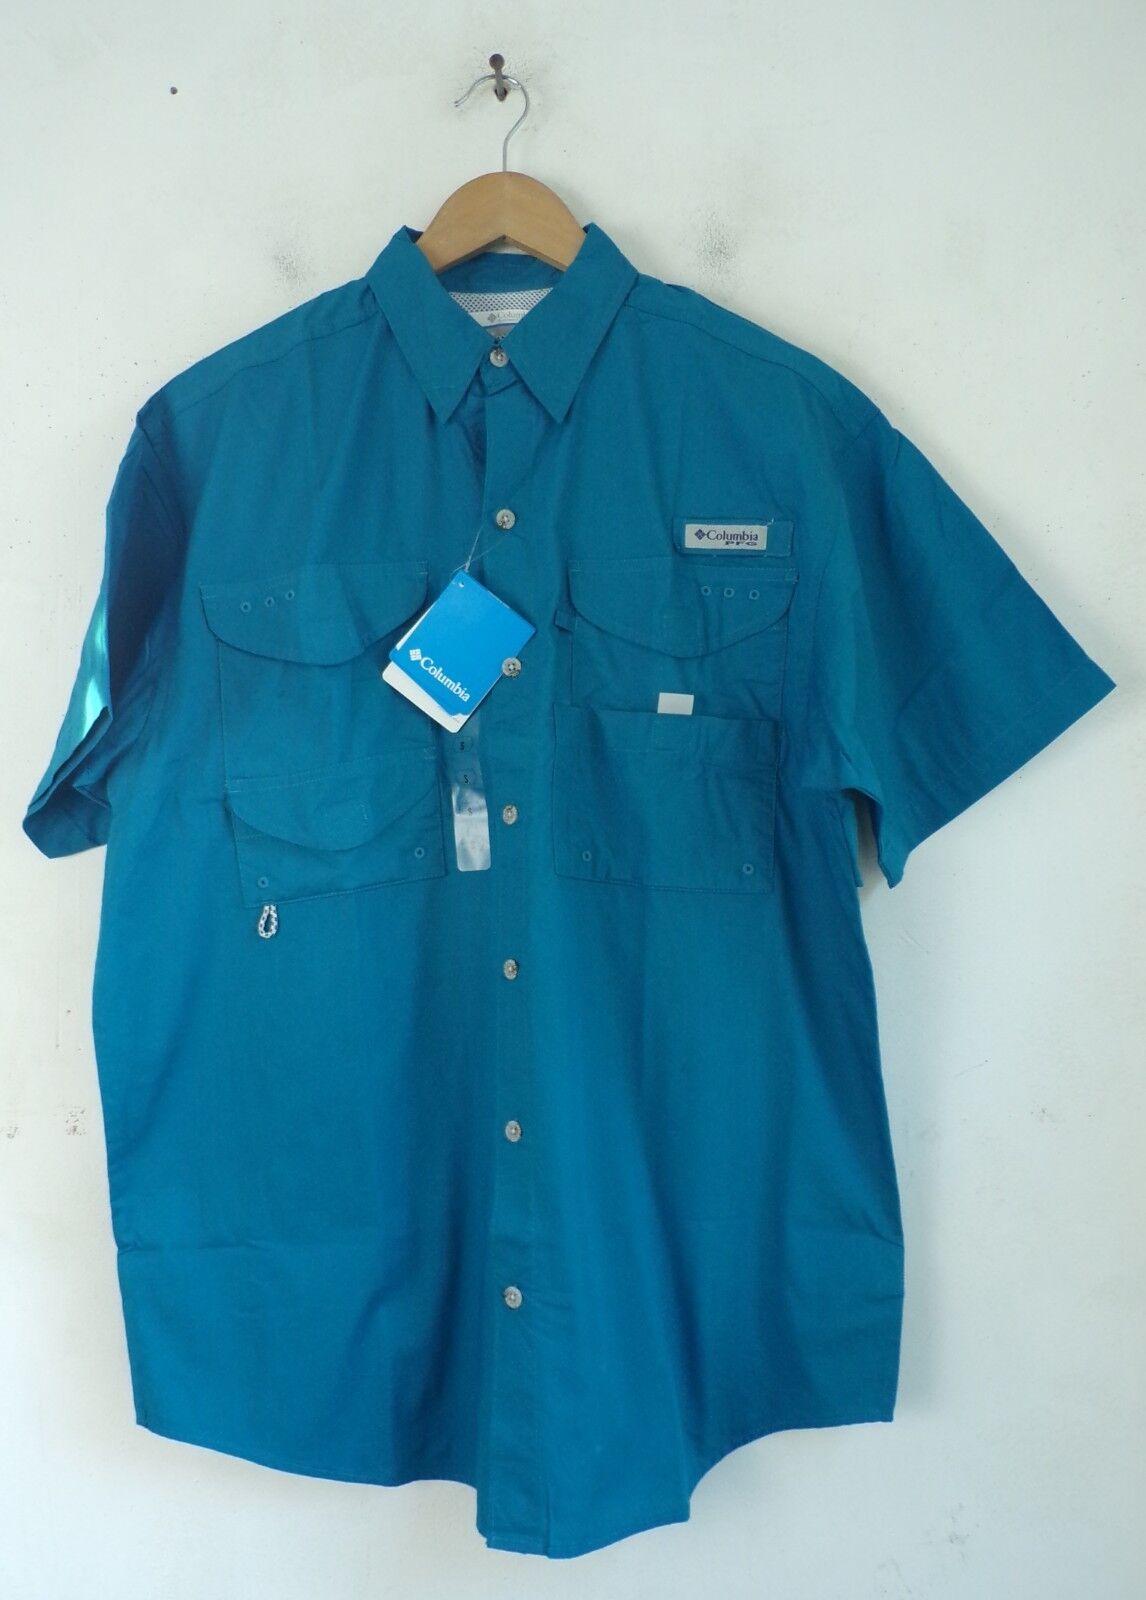 NWT COLUMBIA Mens Small Teal Performance Fishing Gear Short Sleeve Shirt